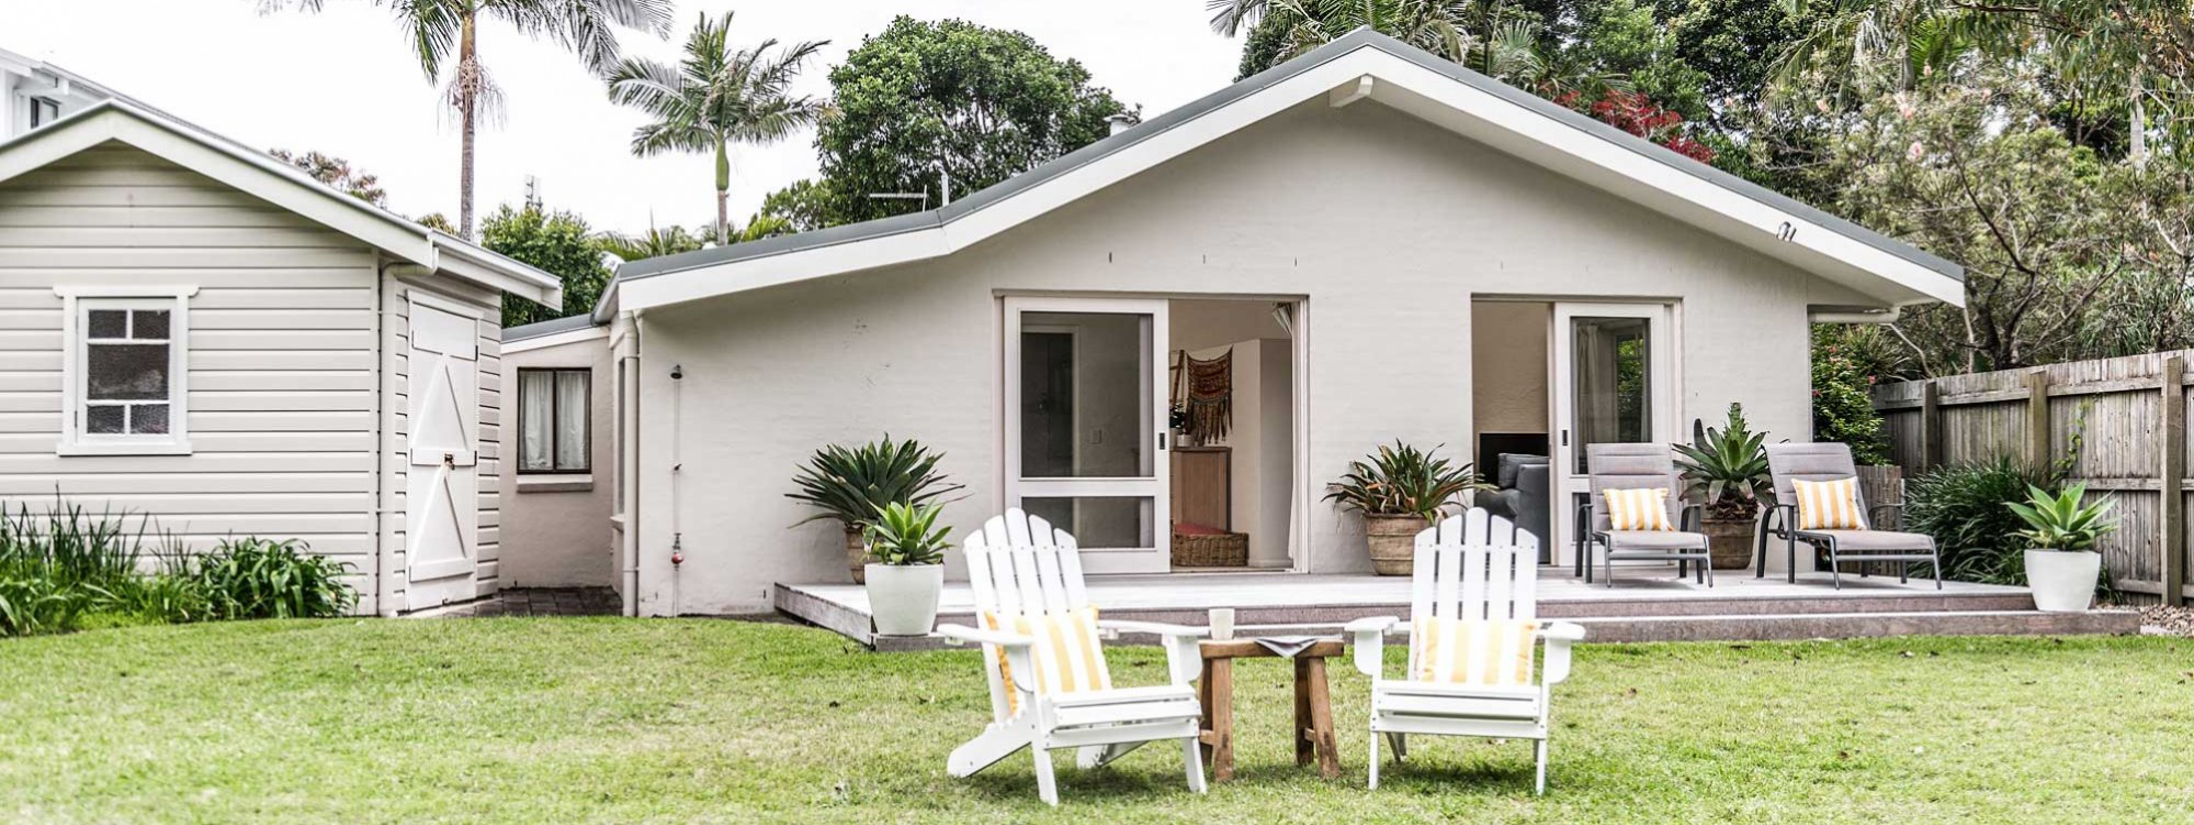 Beachwood - Byron Bay - Backyard b